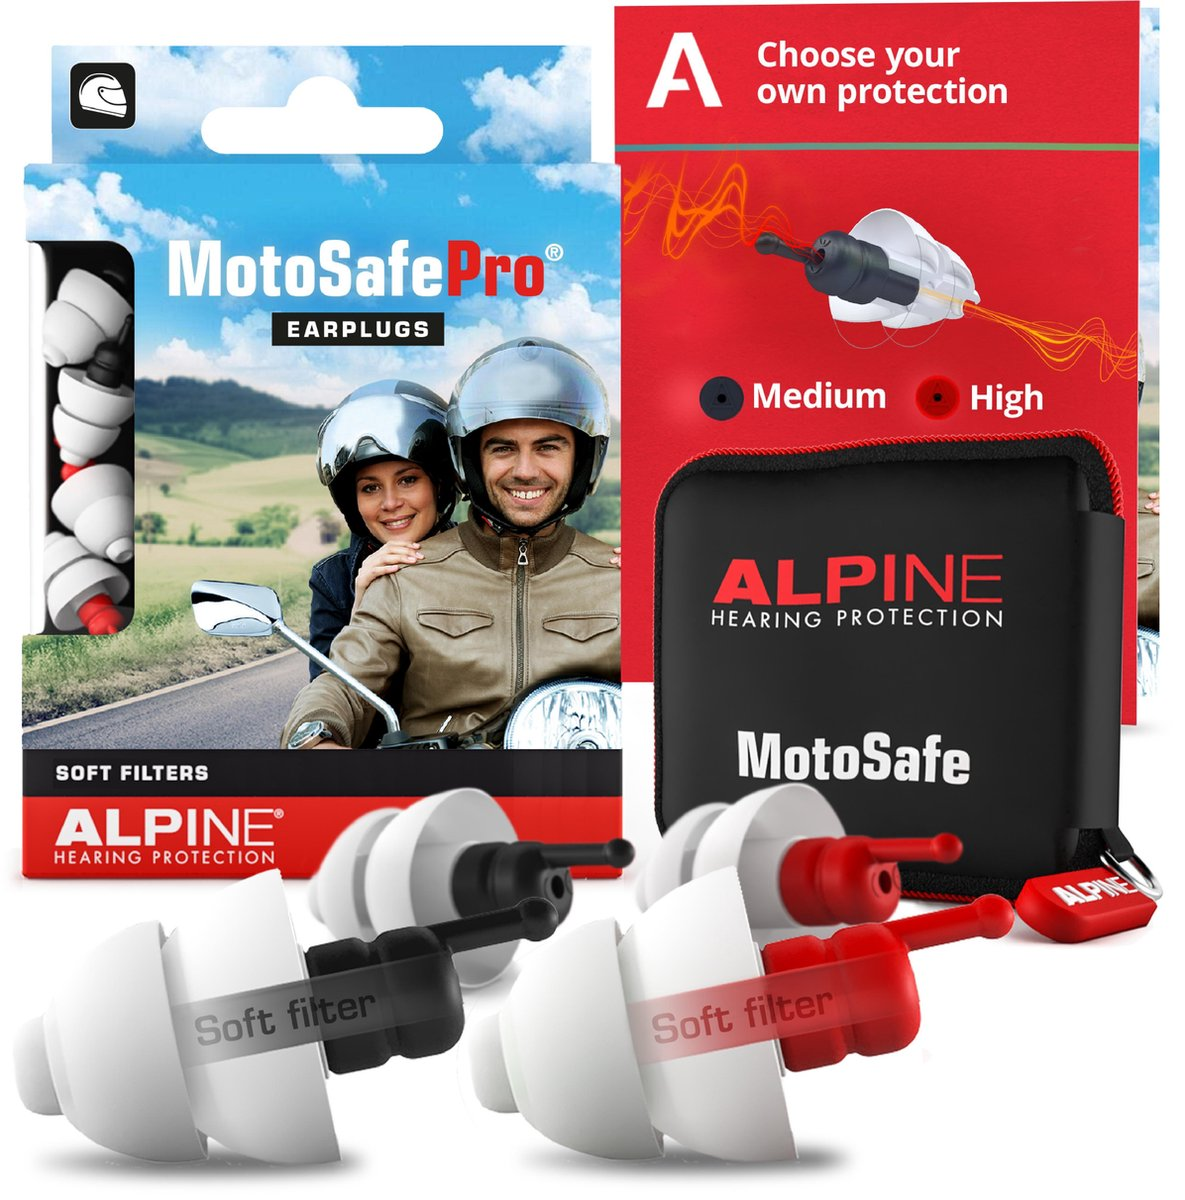 Alpine MotoSafe Pro - Motor oordoppen - Gehoorbescherming Race en Tour - Wit - 2 sets